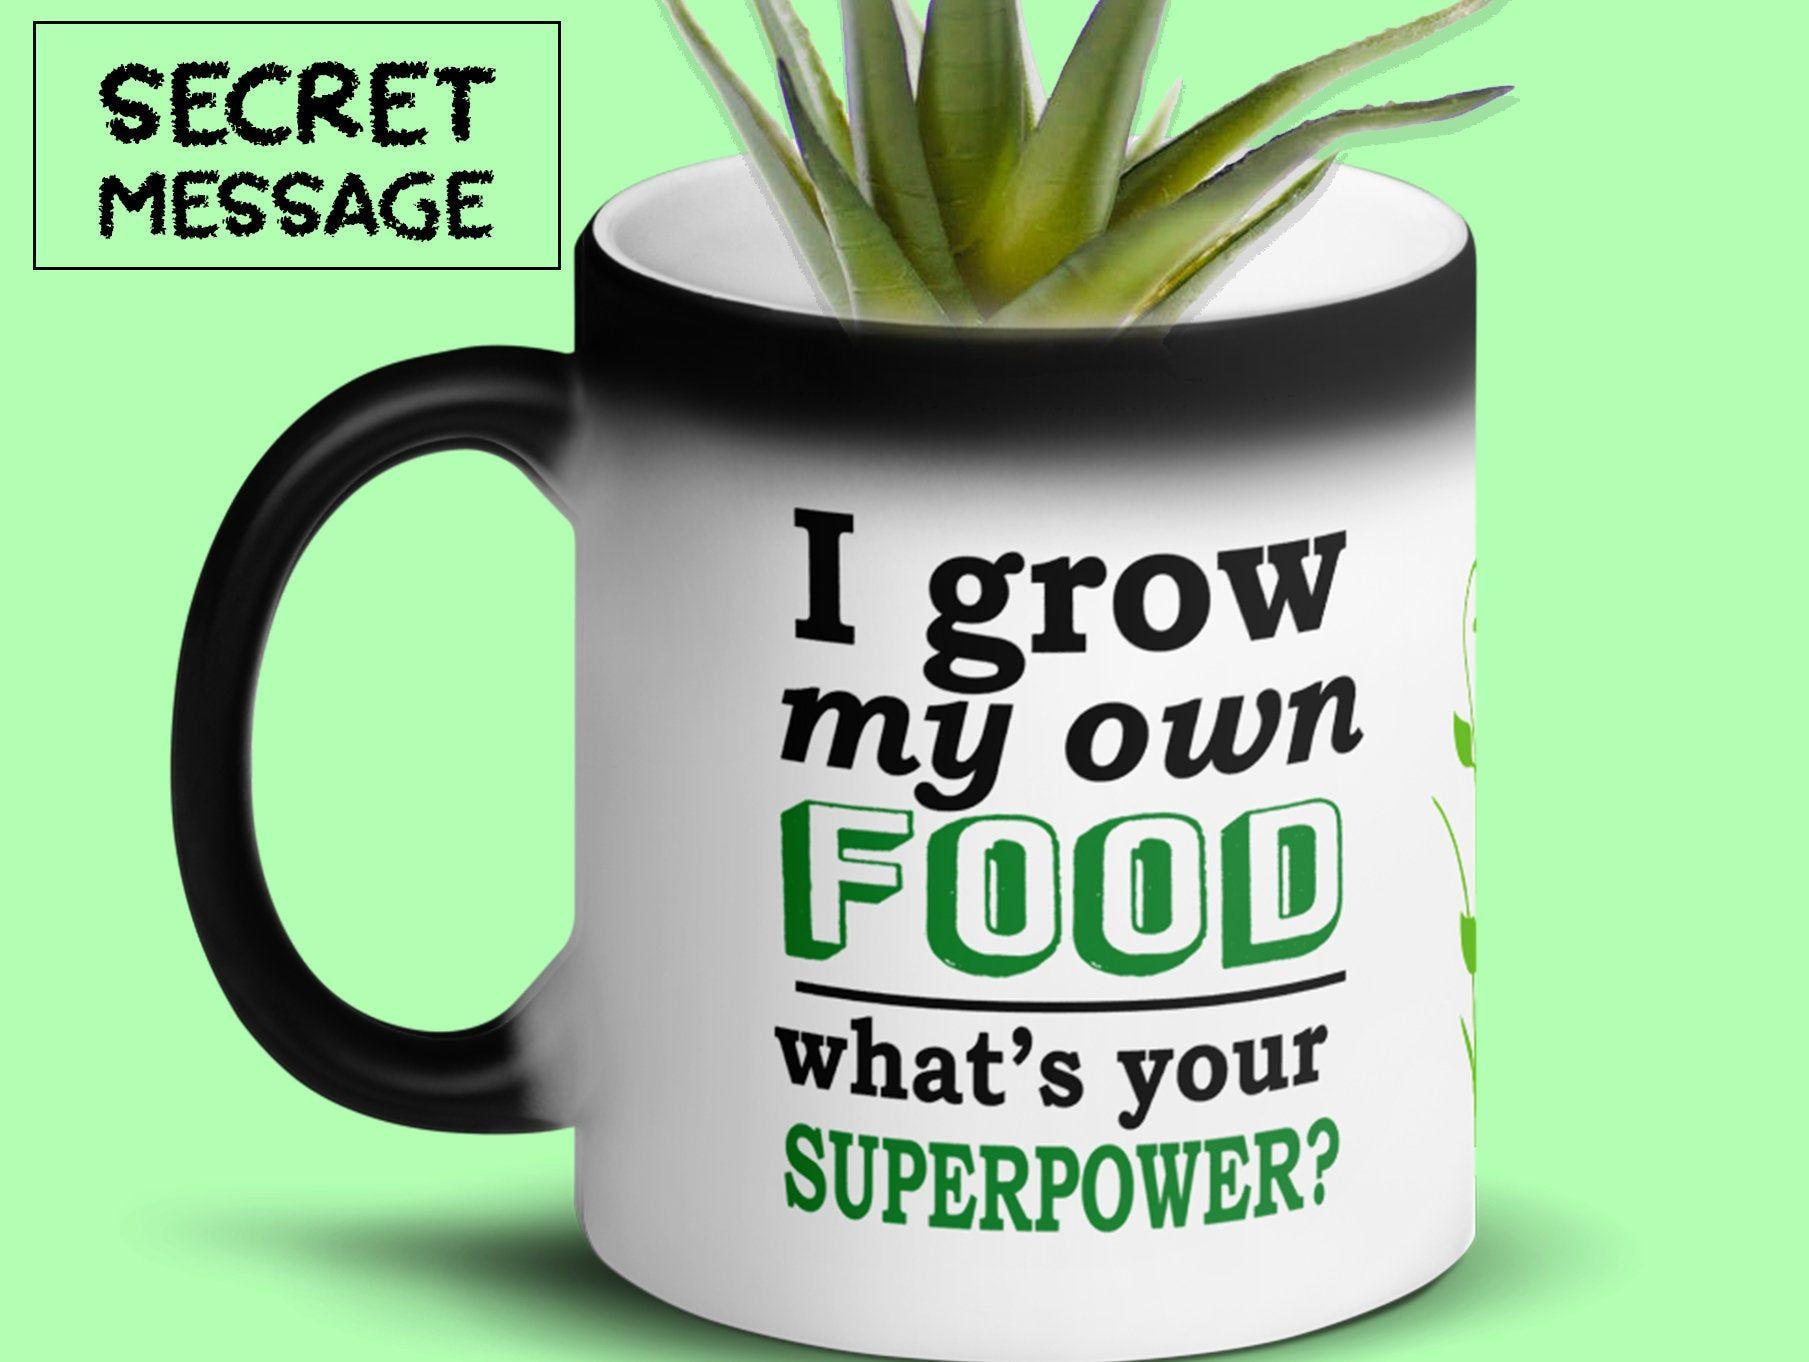 I Grow My Own Food Mug Backyard Farmer Gift Vegan Mug Vegan Gift Organic Gift Garden Gift Gardening Gift Backyard Farmer M Vegan Gifts Backyard Farmer Mugs